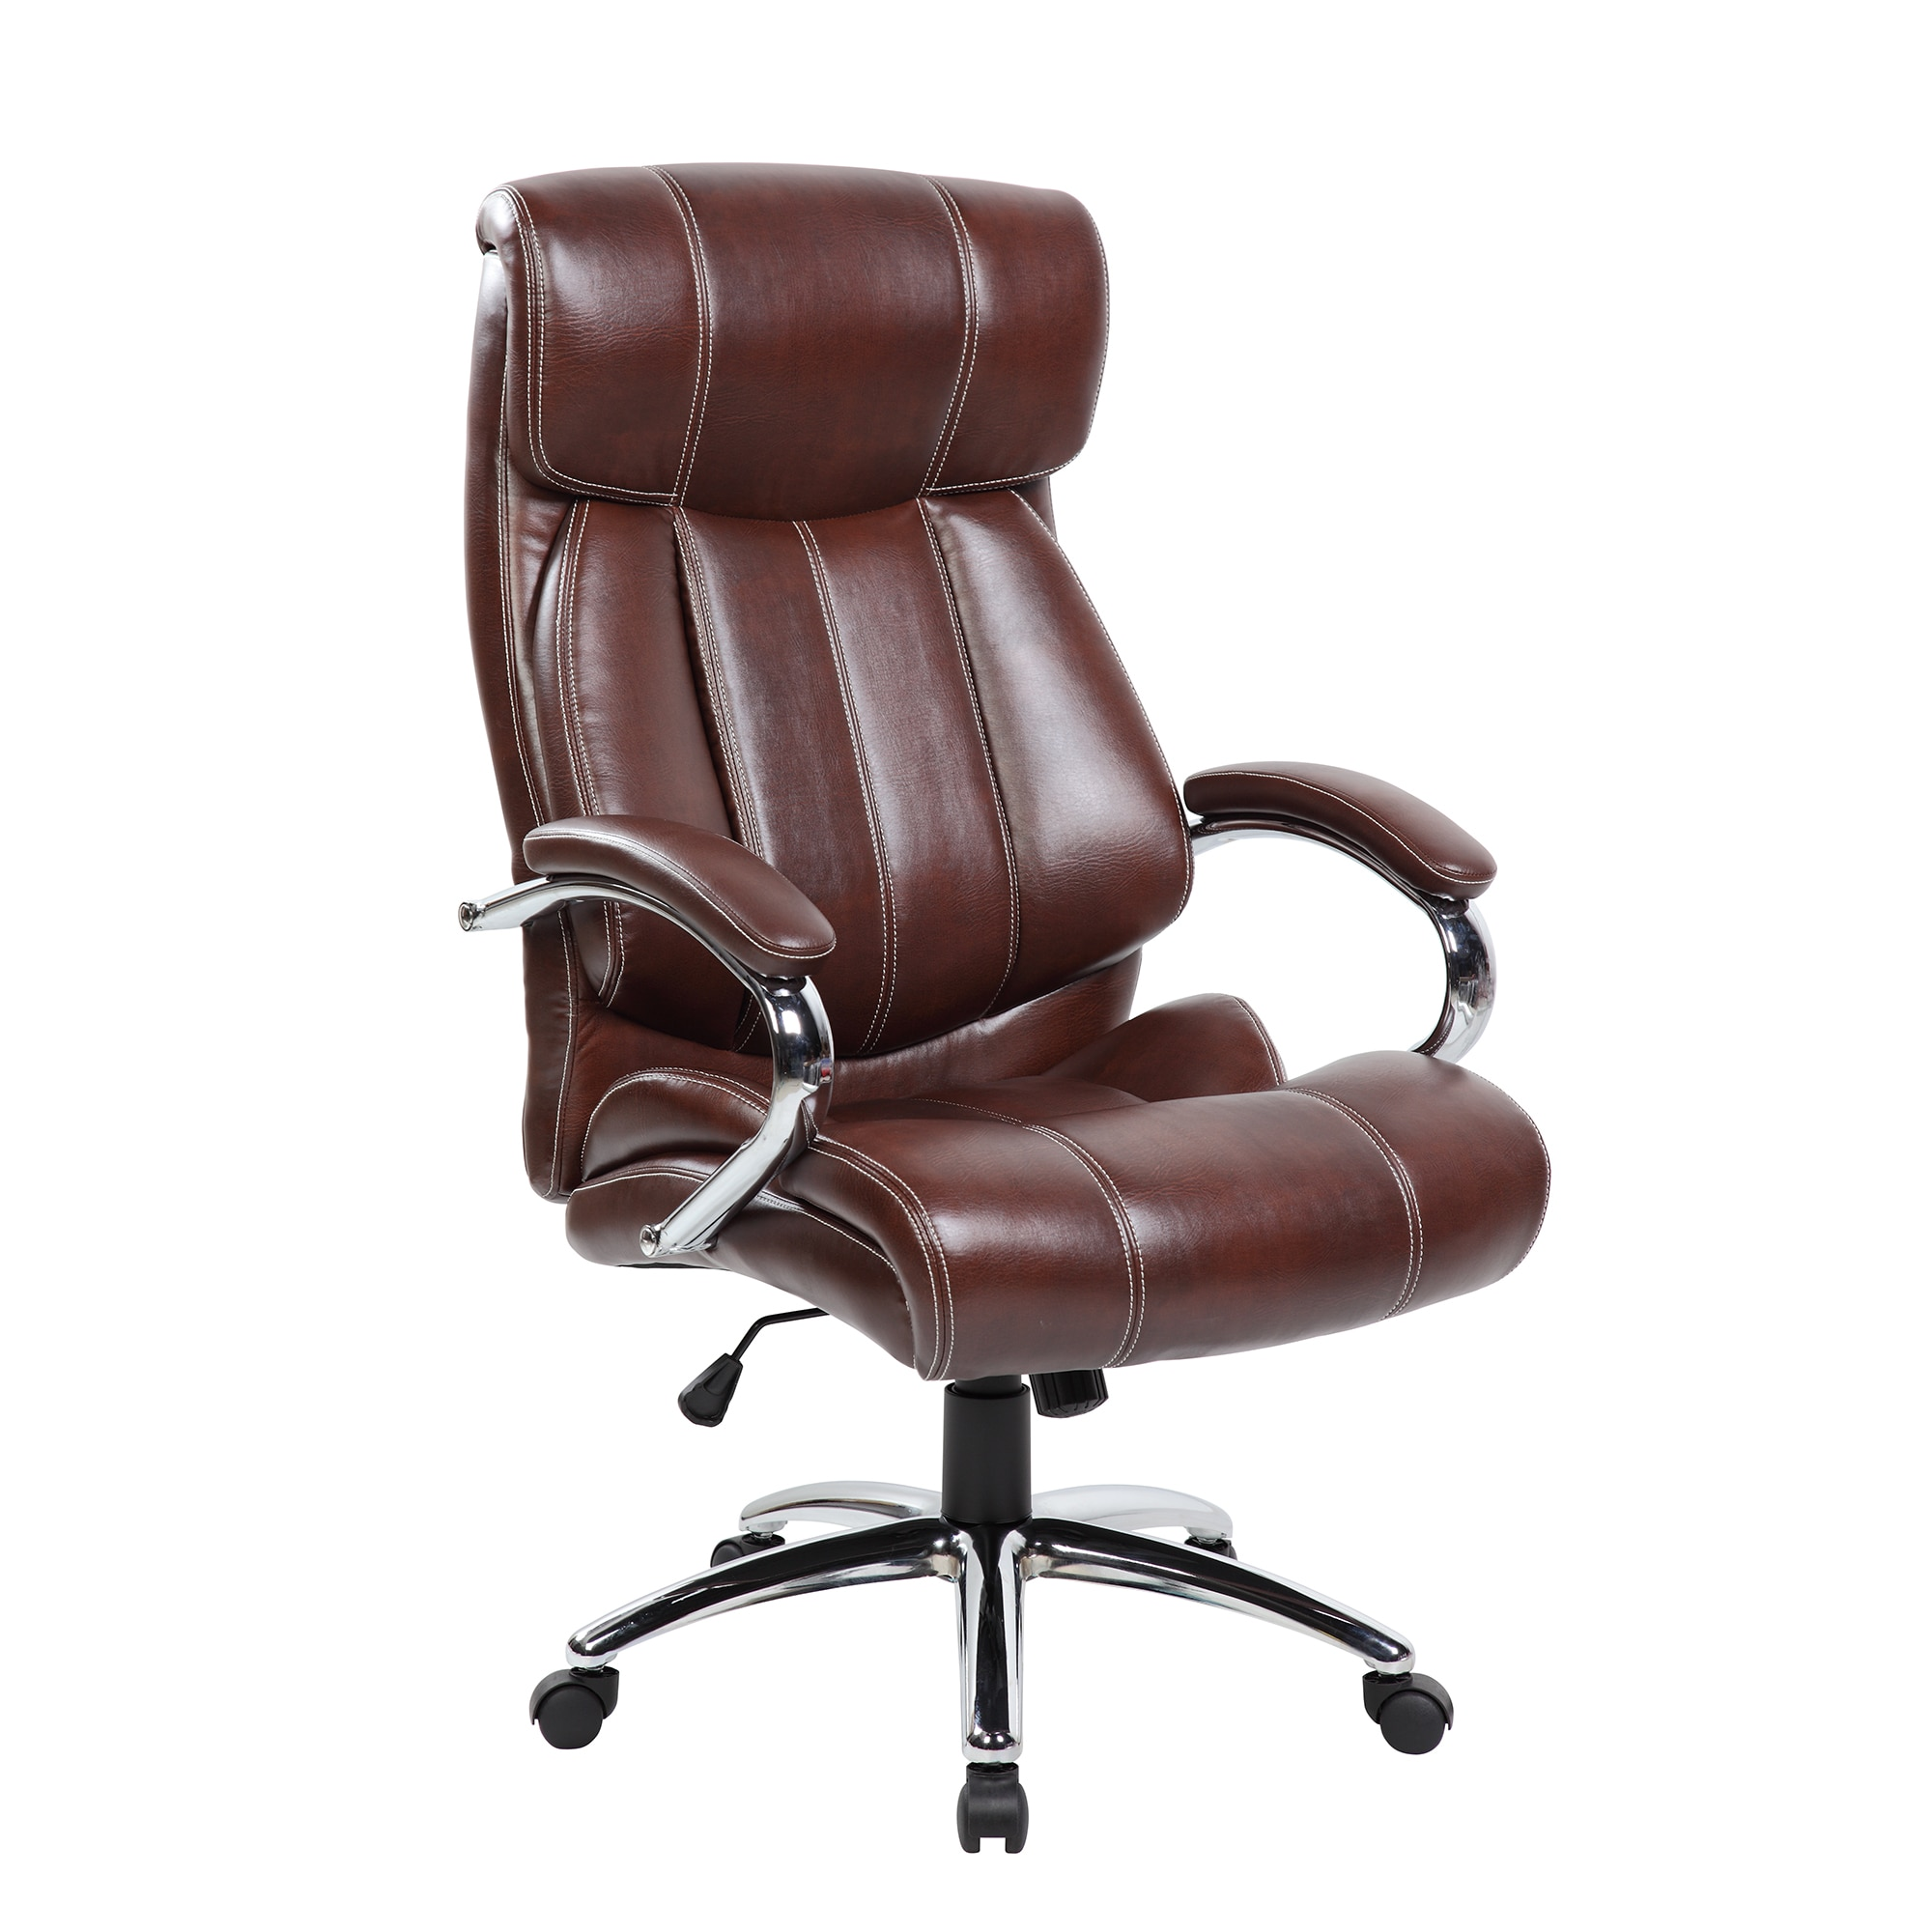 Kring Lincoln Ergonomikus irodai szék, Barna